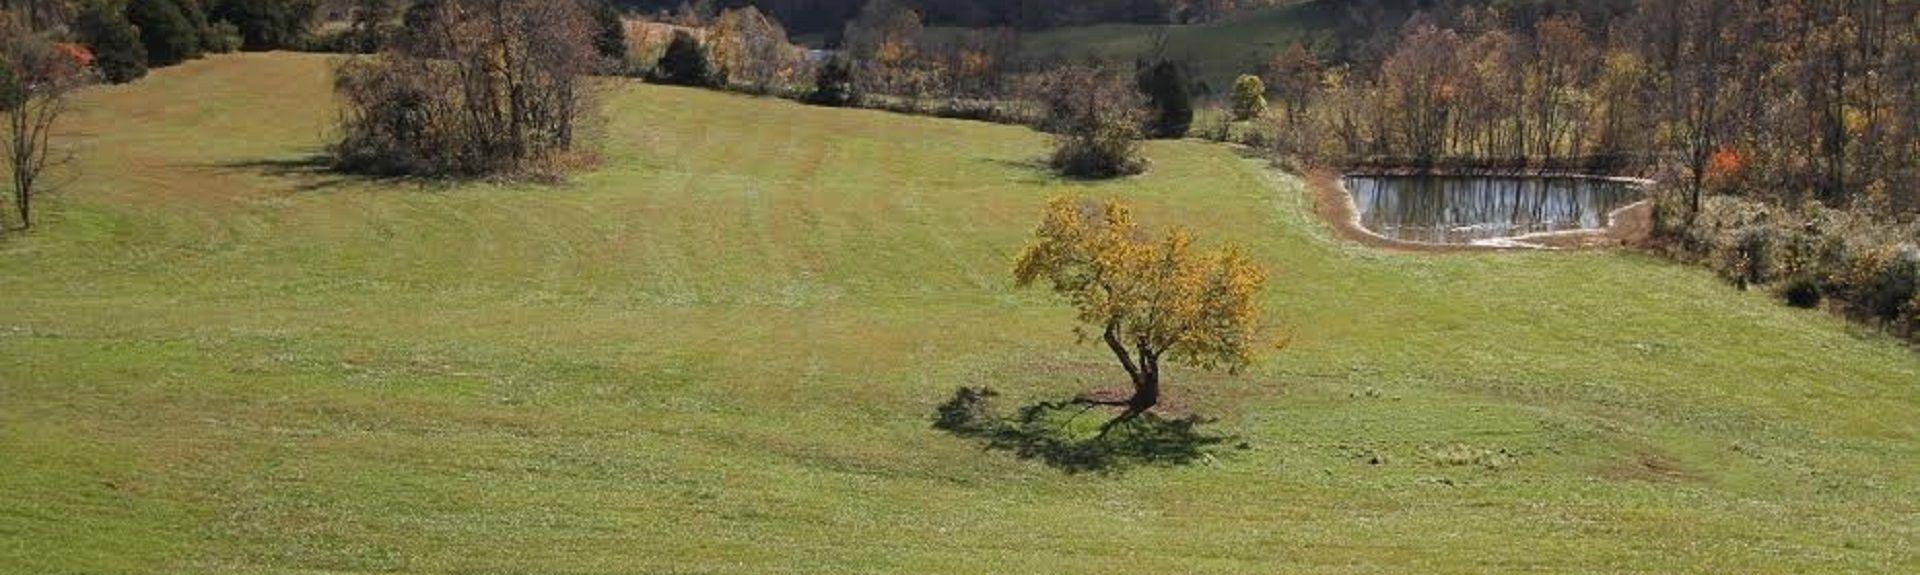 Rockbridge County, VA, USA